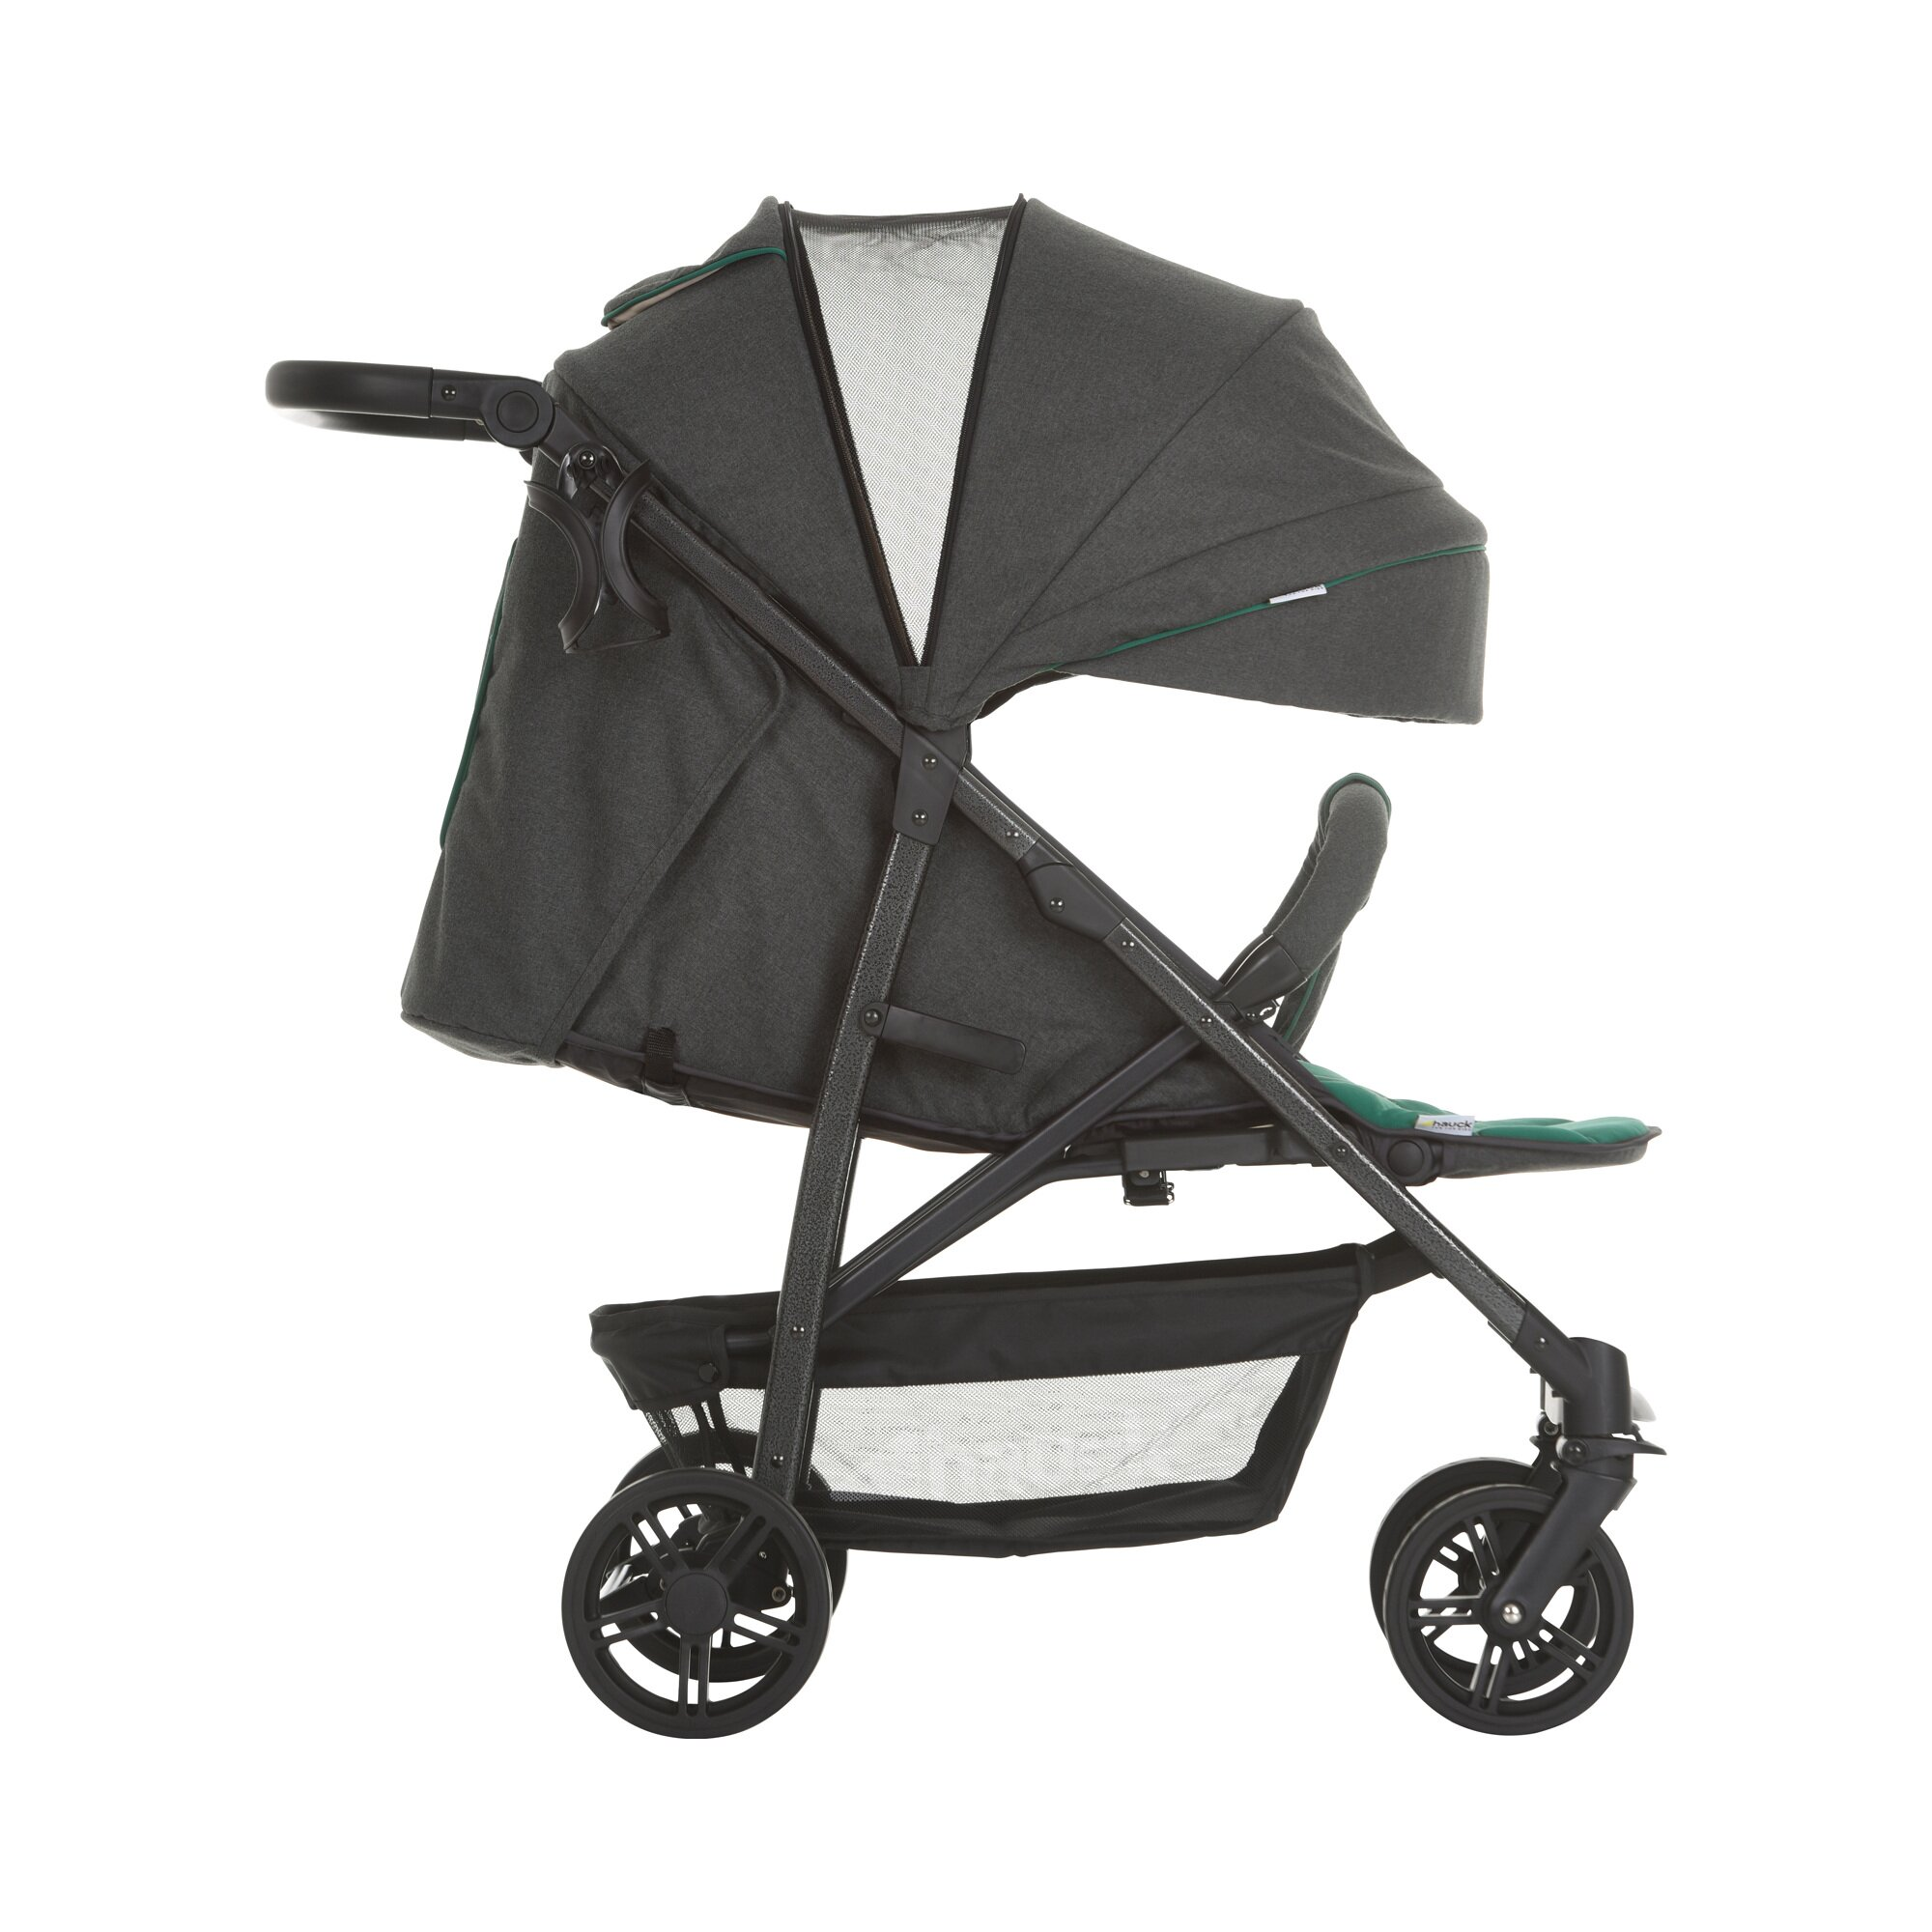 hauck-rapid-4-s-shopper-design-2018-gruen